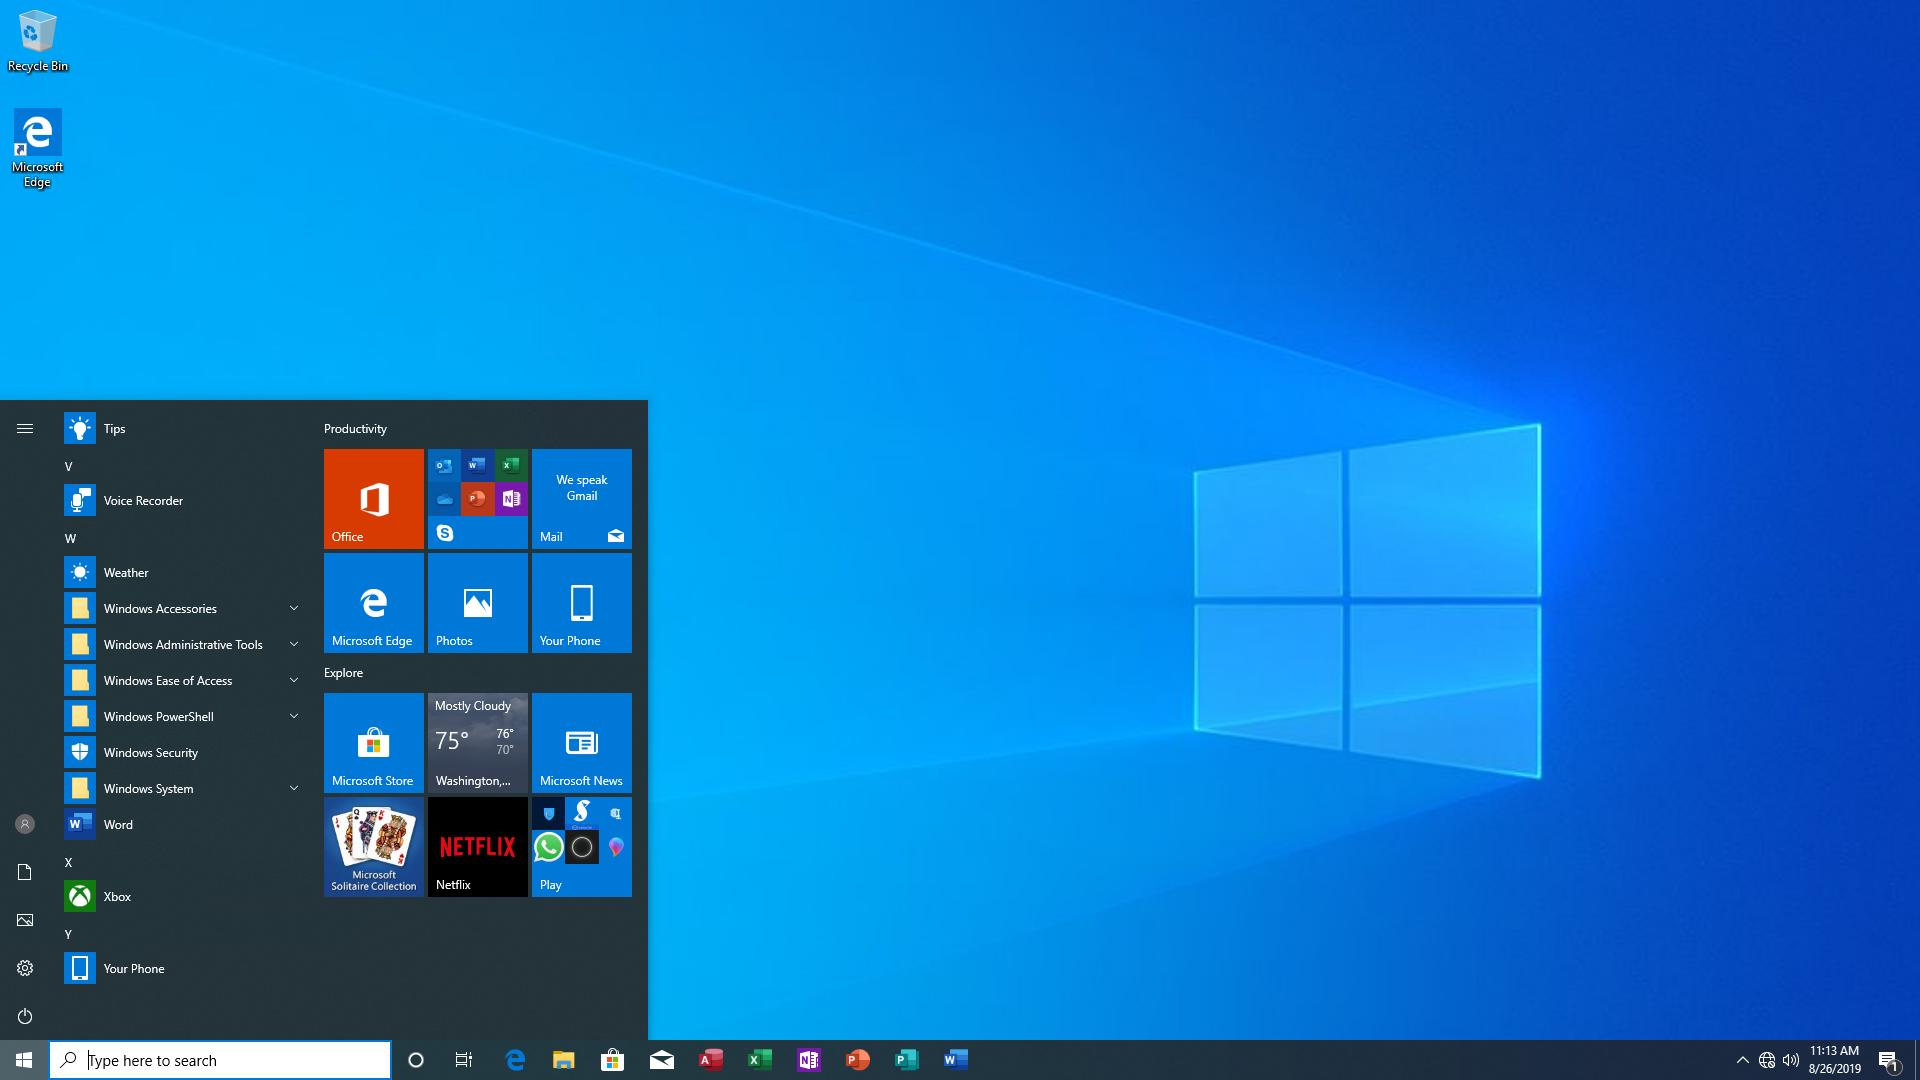 Windows 10 Pro 19H1 1903 Build 18362.295 + Office Pro Plus 2019 Integrated Multilingual